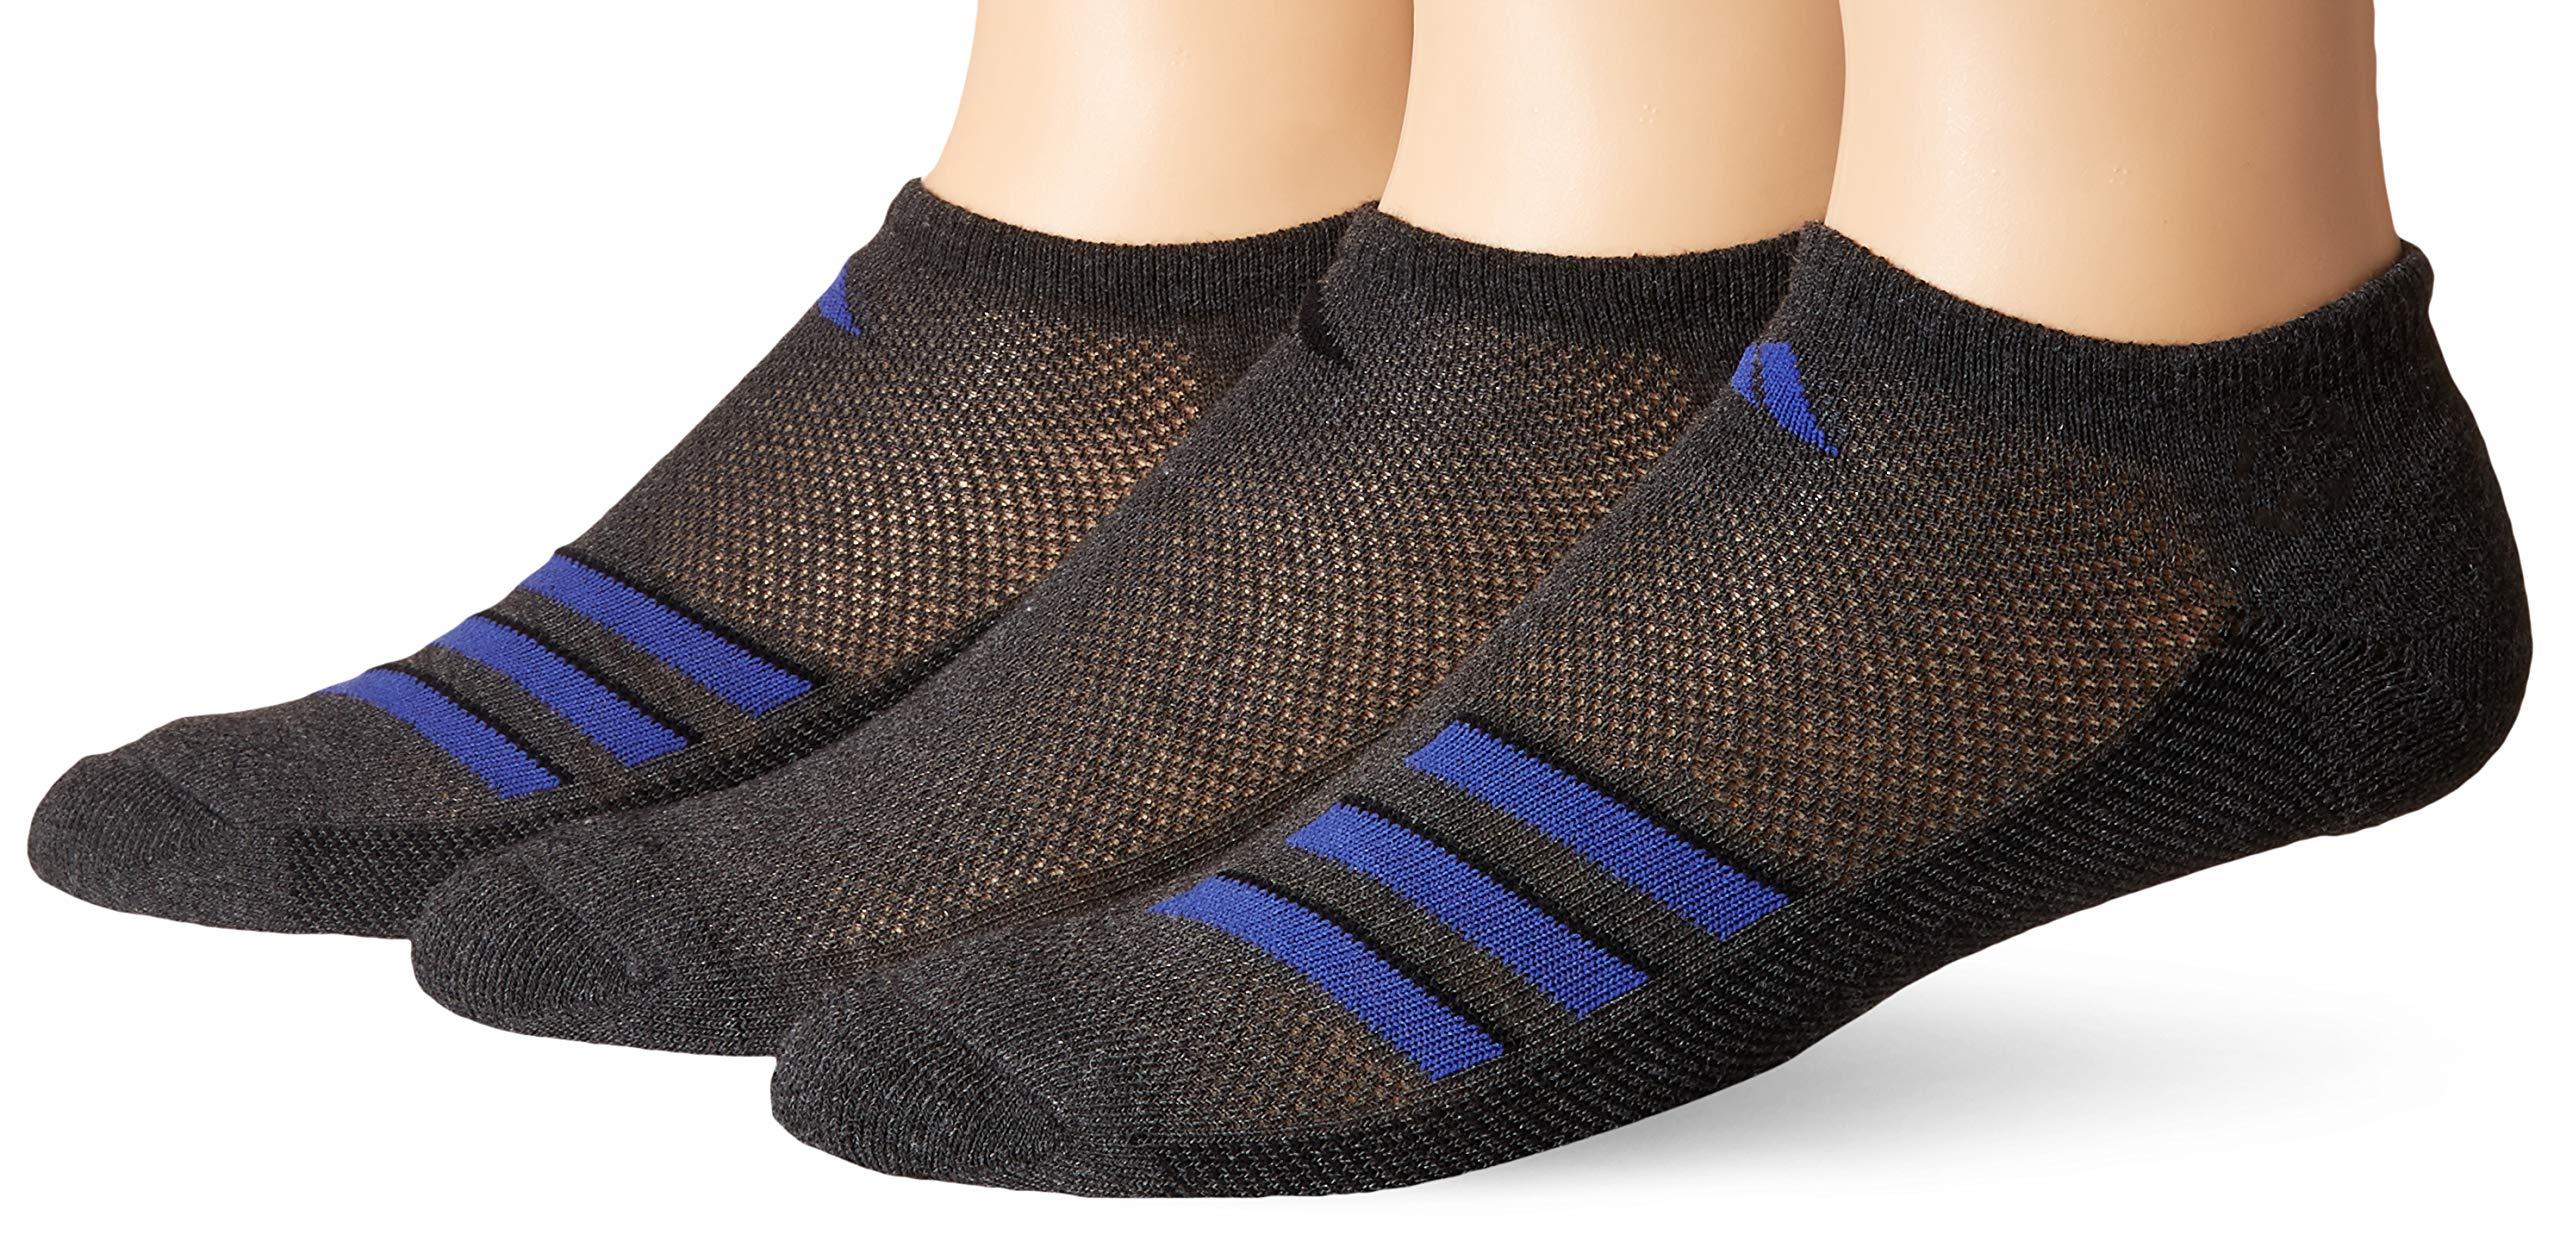 adidas Men's Climacool Superlite No Show Socks (3-Pack), Dark Grey Heather/Black/Active Blue, 6-12